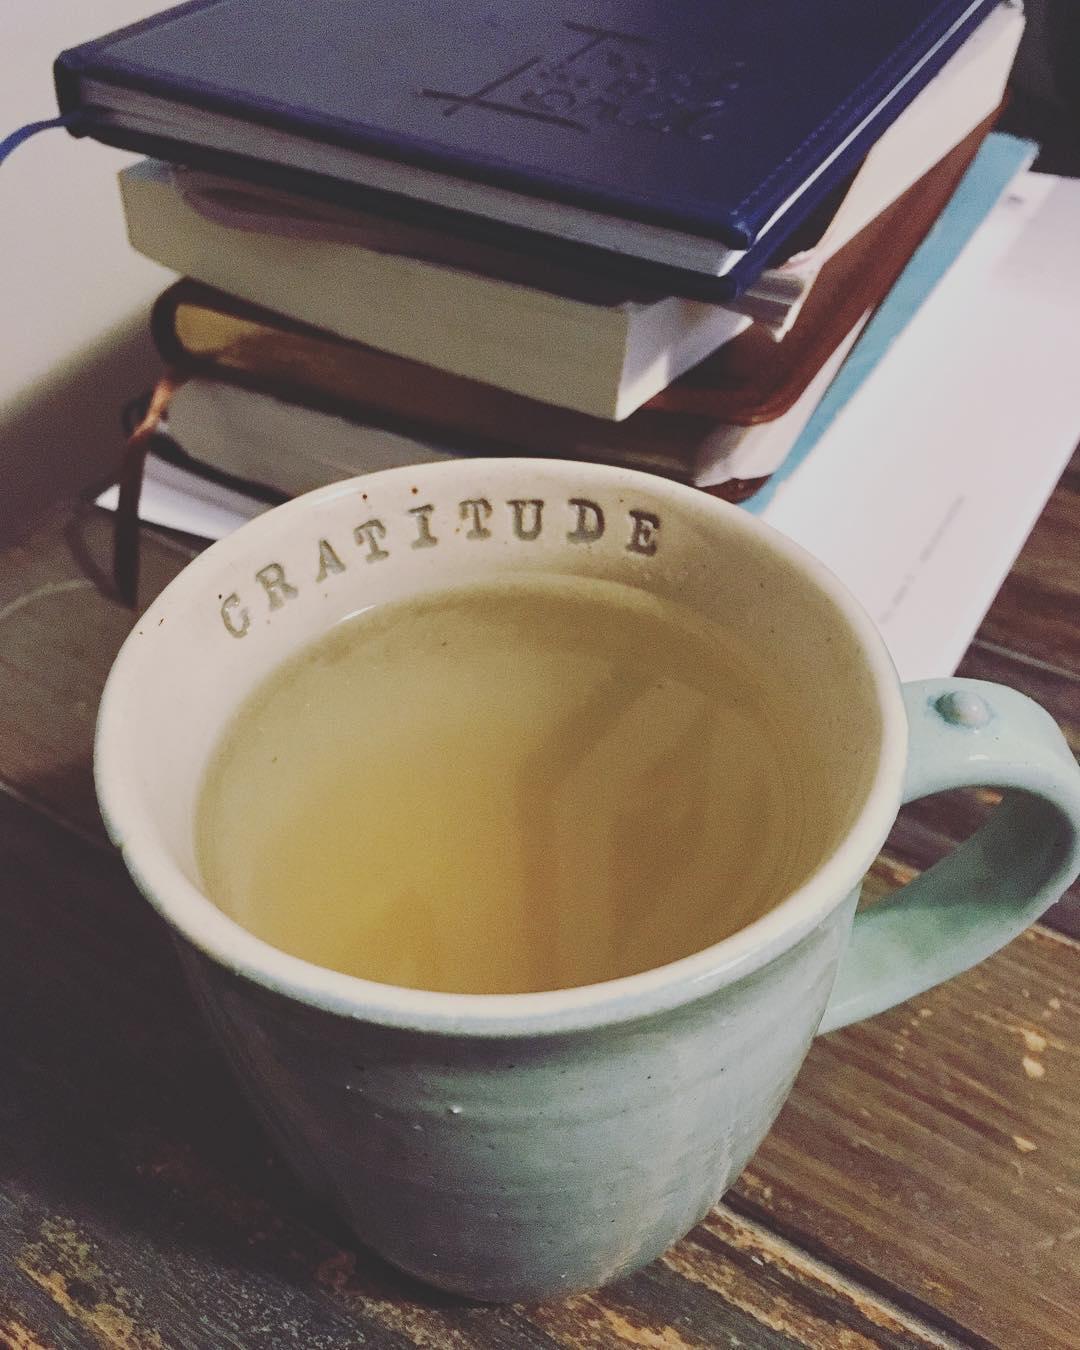 gratitude cup.jpg